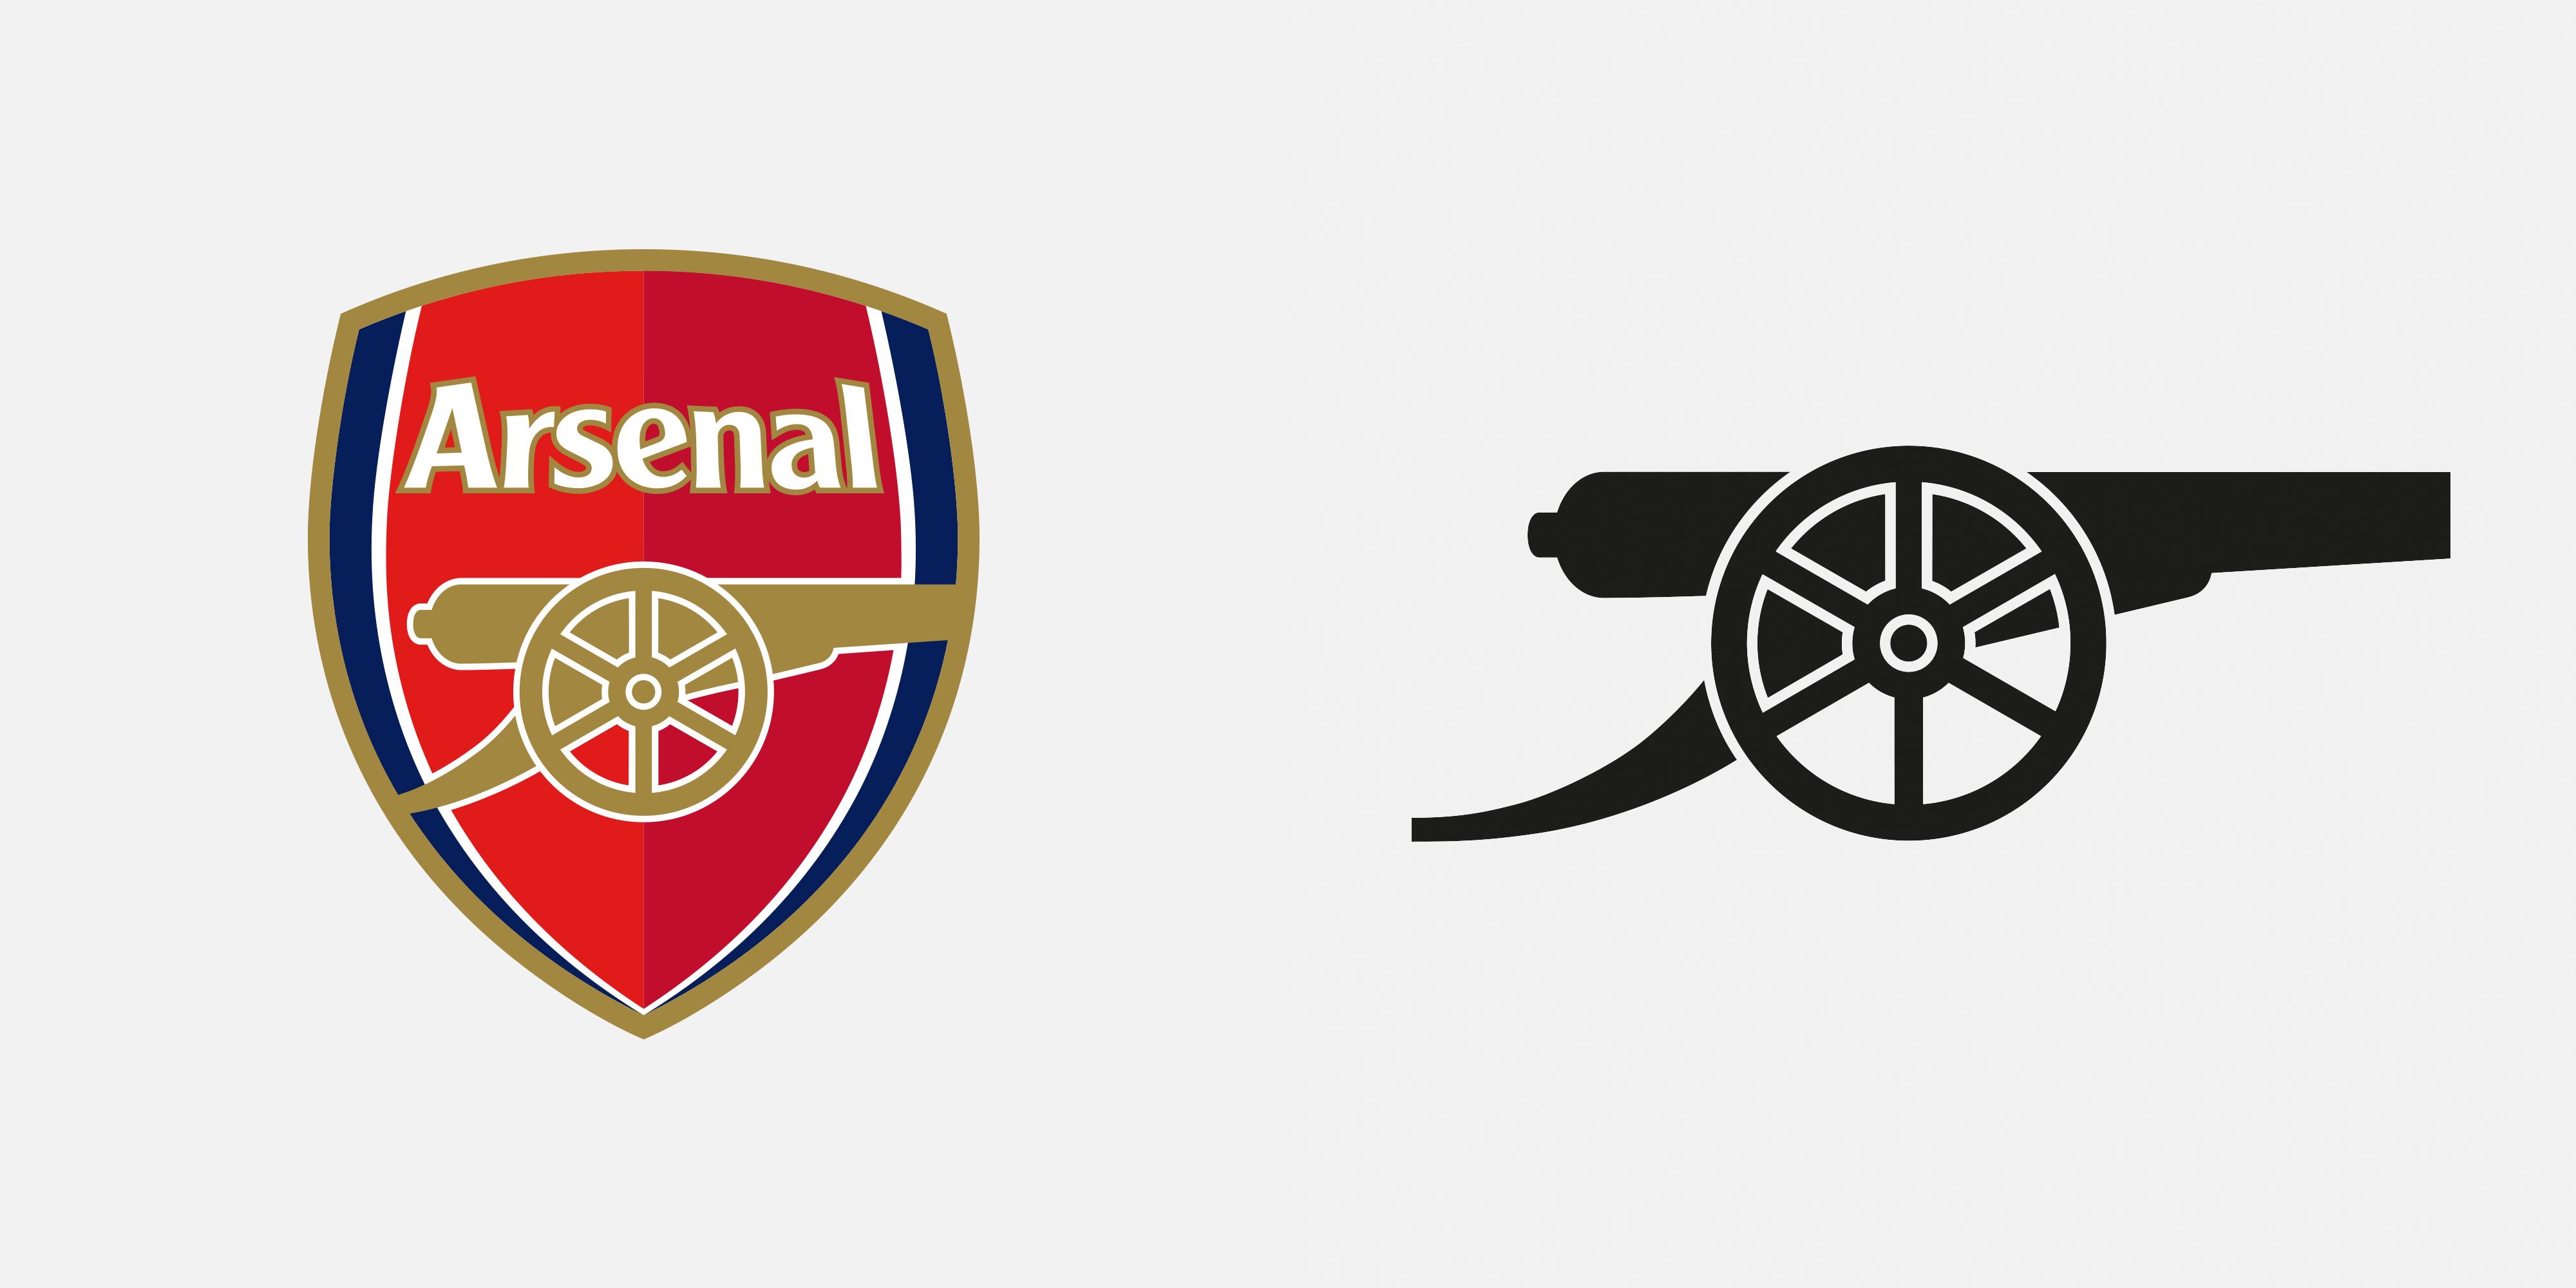 Arsenal Brand